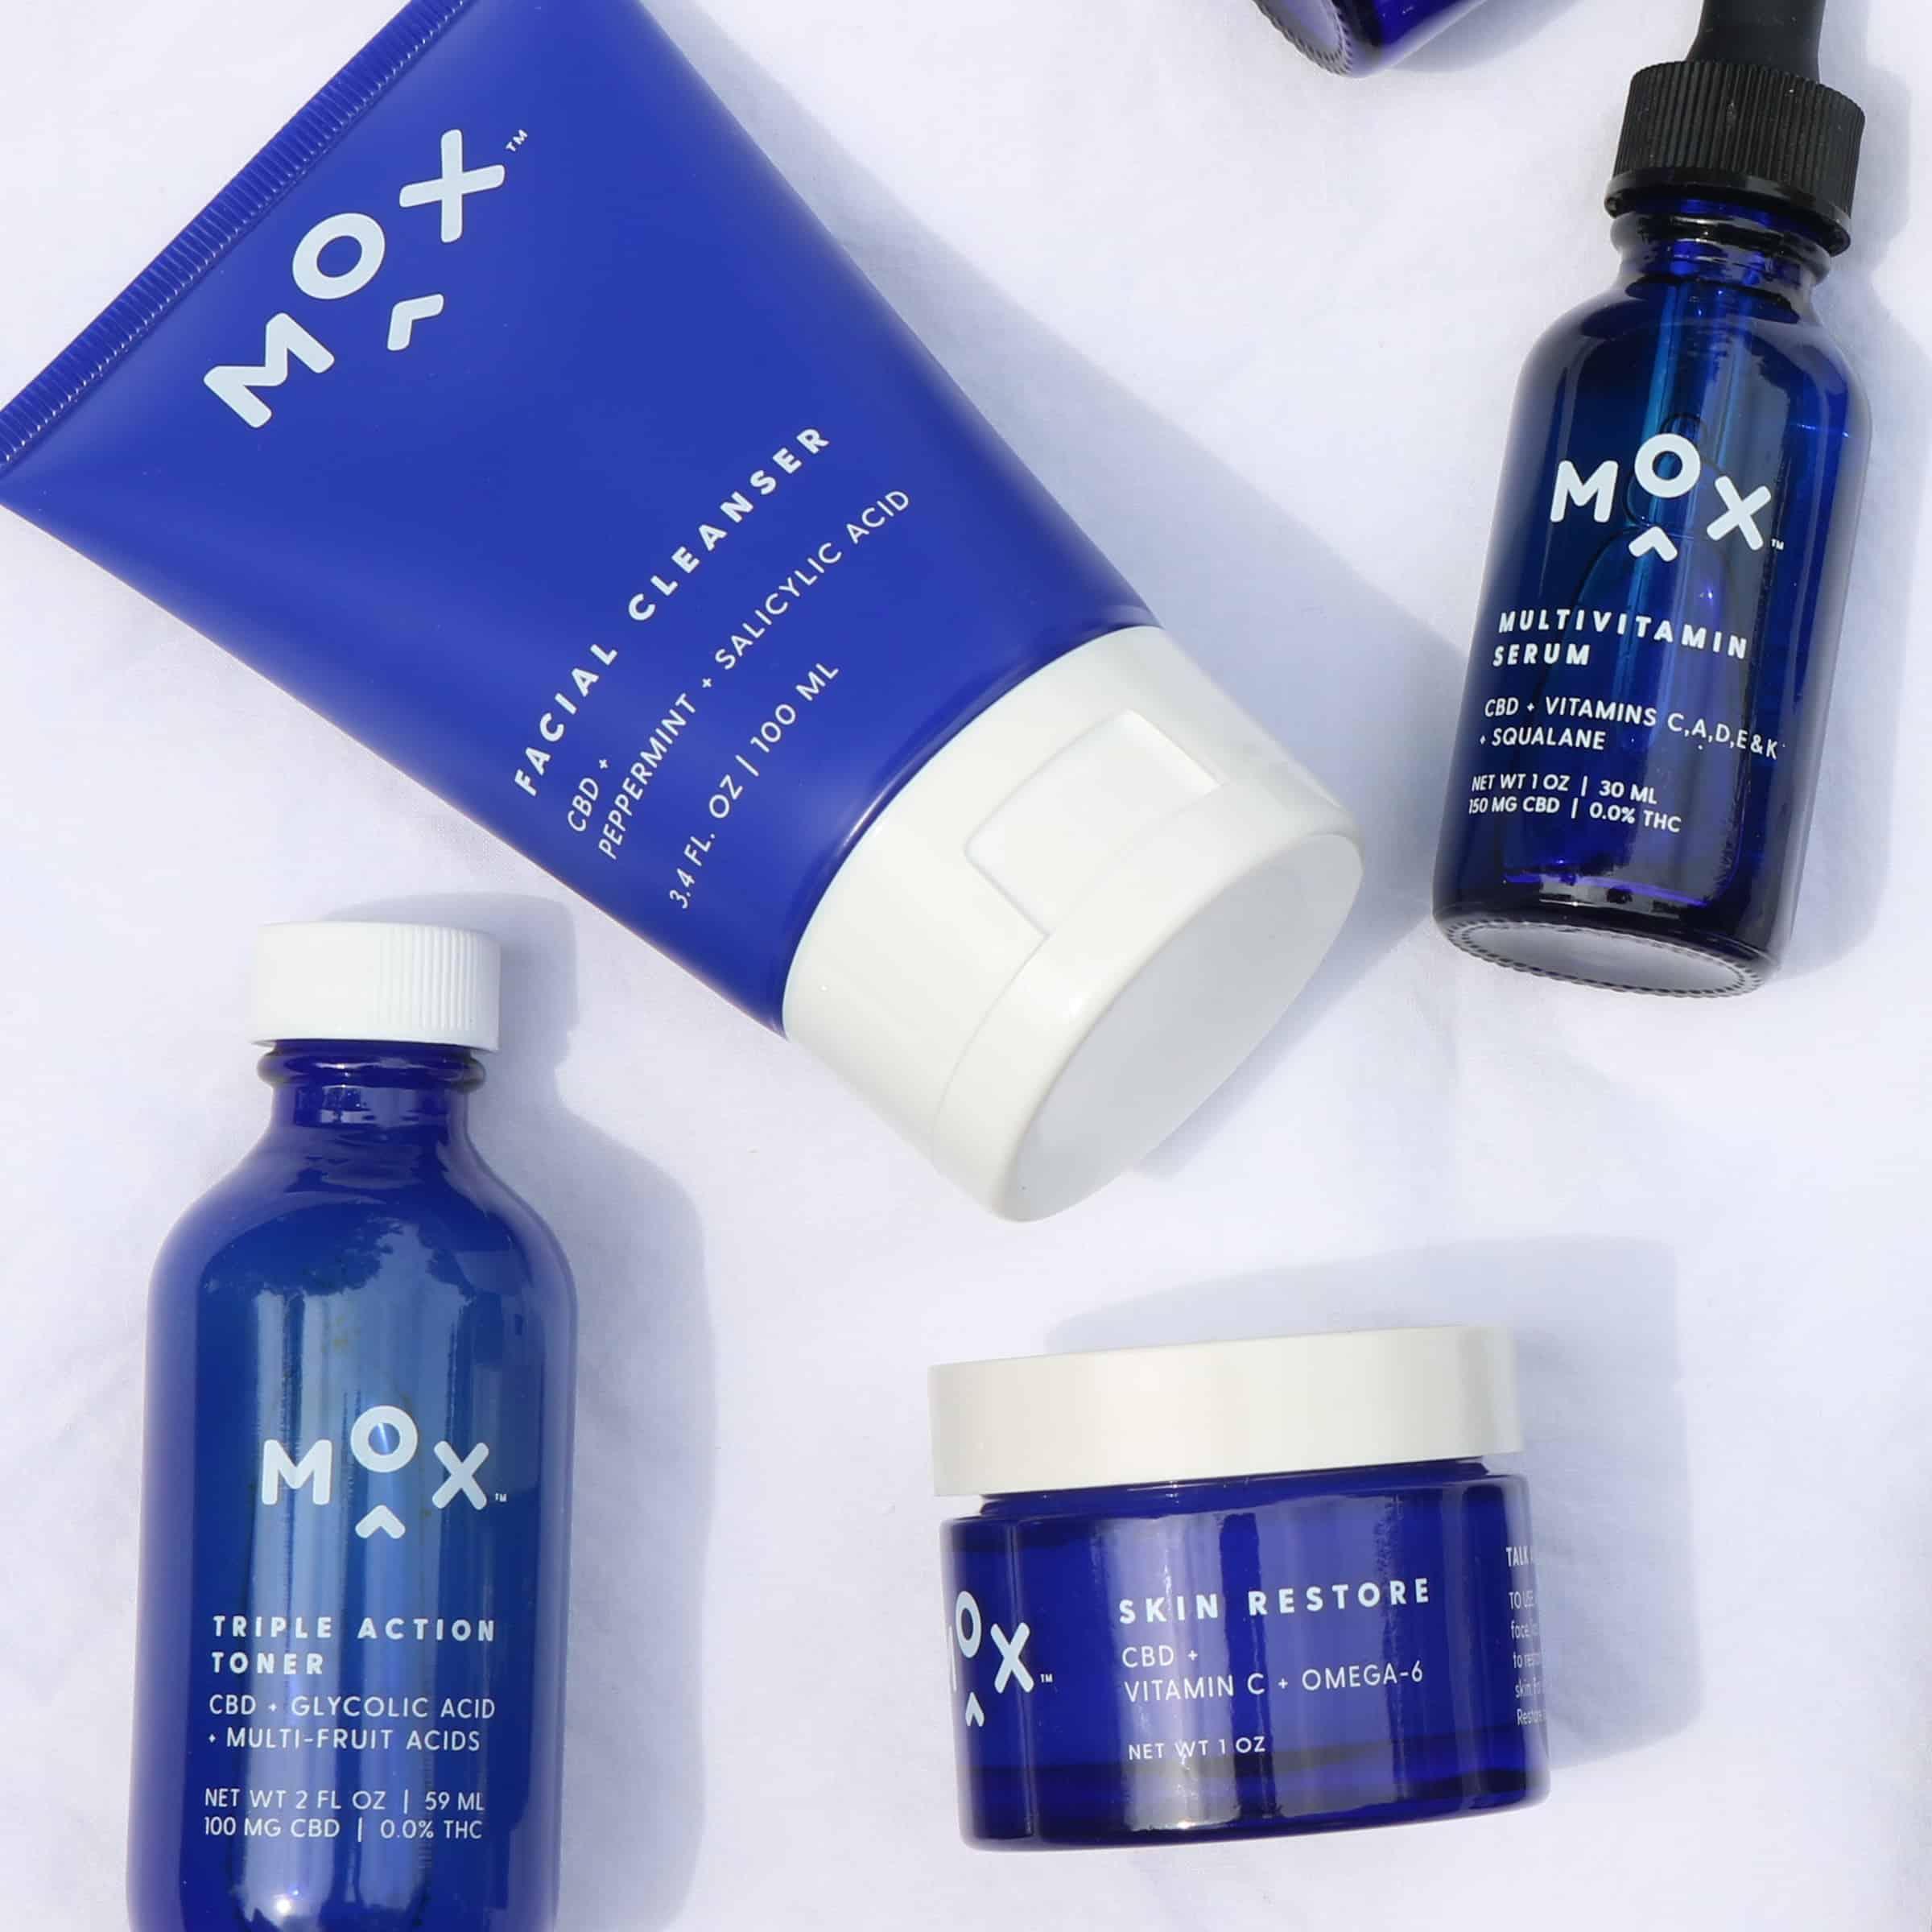 mox skincare flatlay